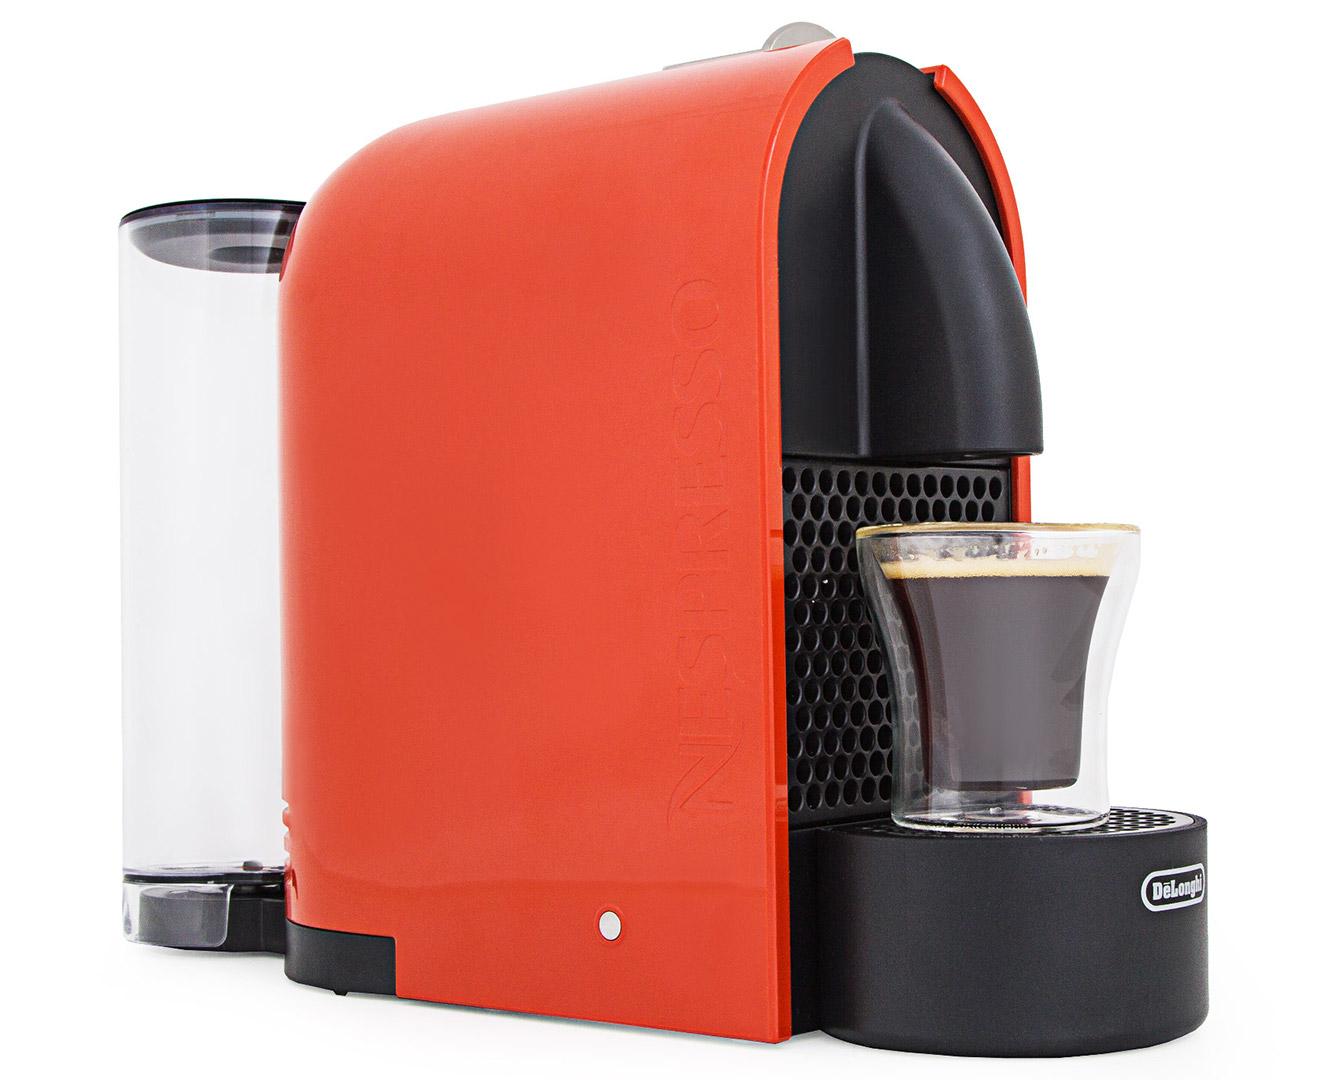 Catch.com.au DeLonghi U Nespresso Coffee Machine - Orange